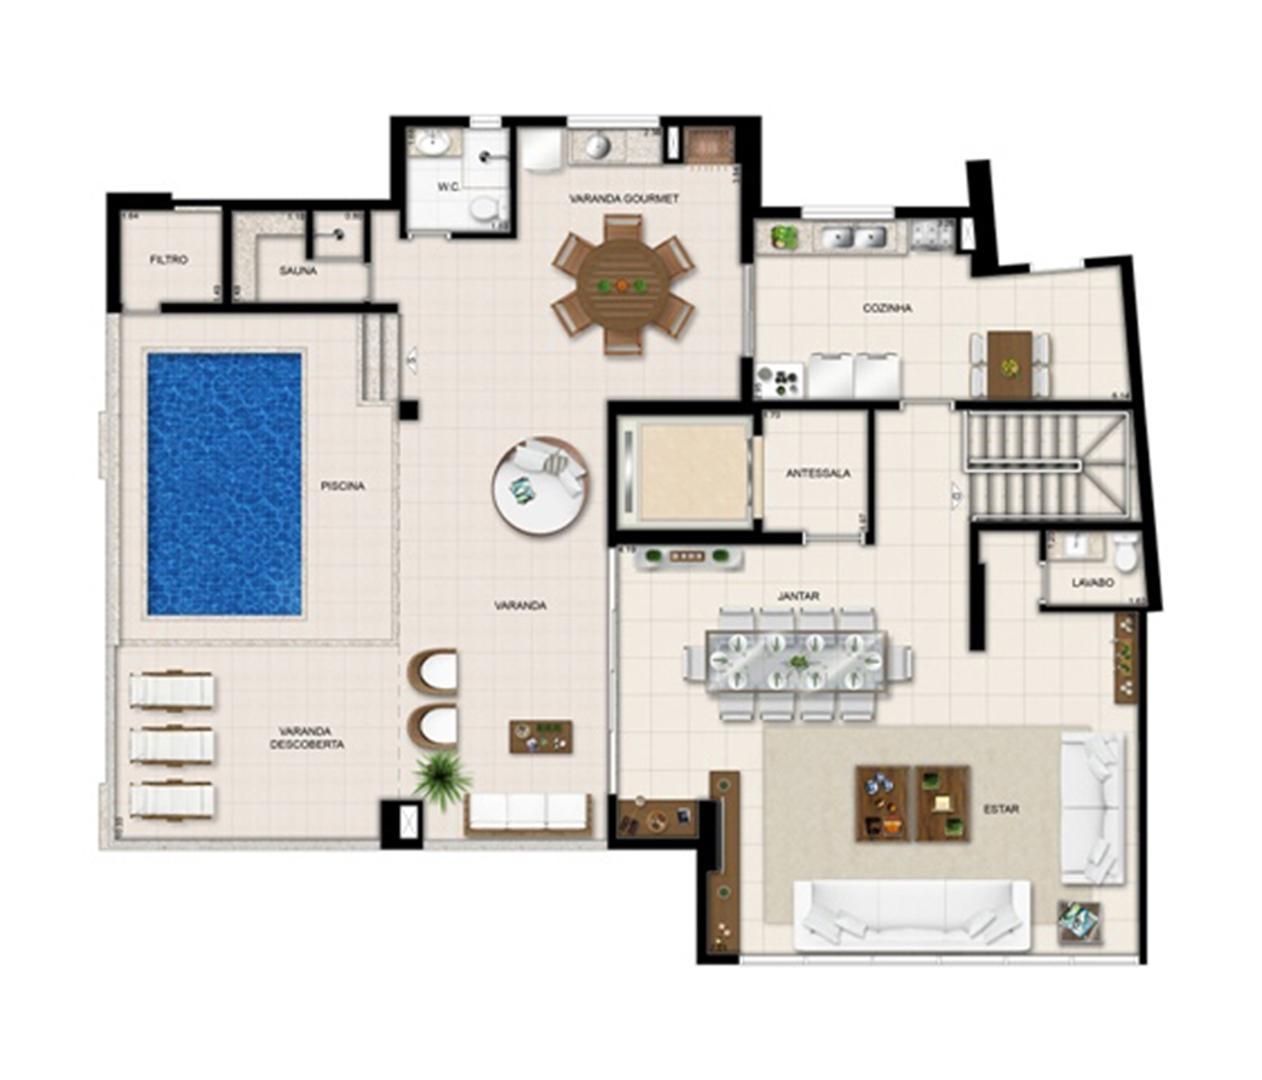 Planta duplex superior - Torre Boulevard- Final 01 390 m² | Chateau Marista LifeStyle – Apartamentono  Setor Marista - Goiânia - Goiás